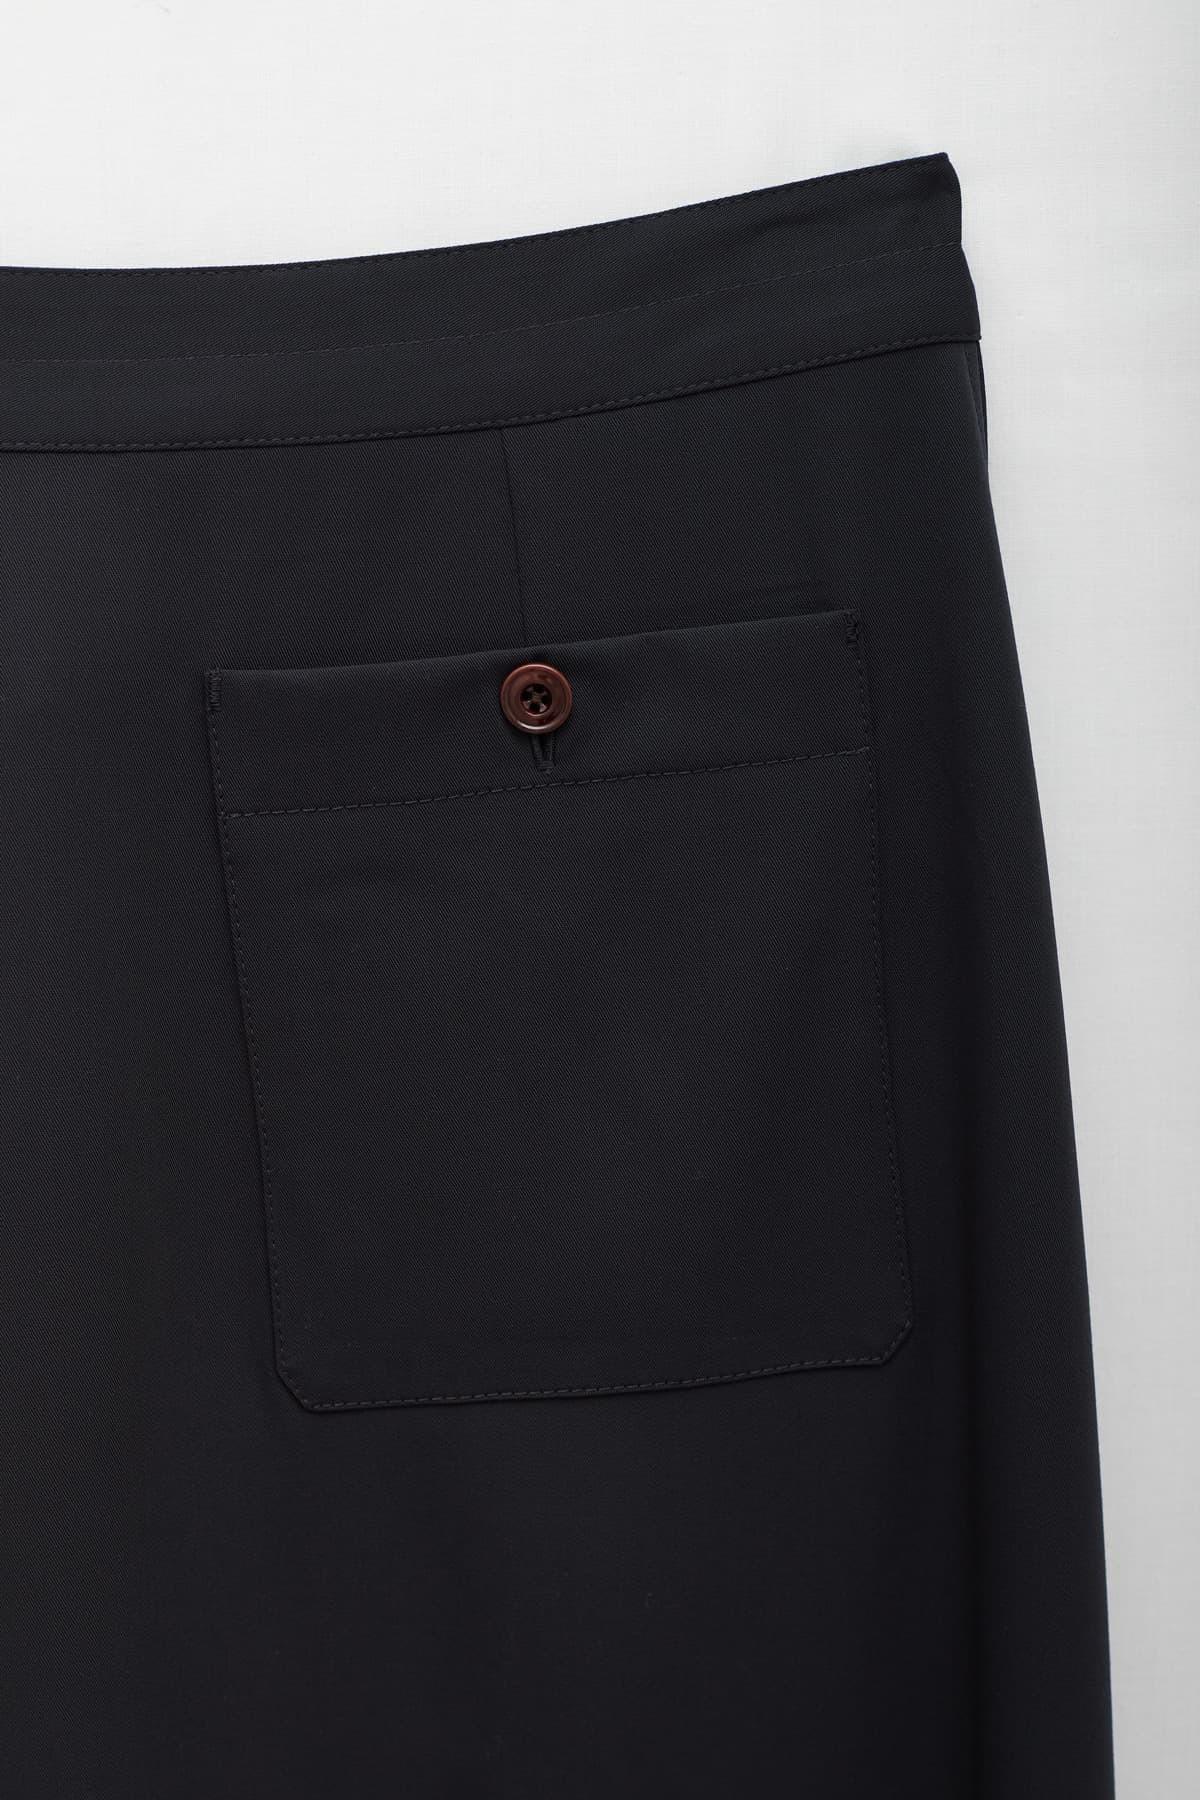 Comprar Aries Beige Waffle Knit Jumper